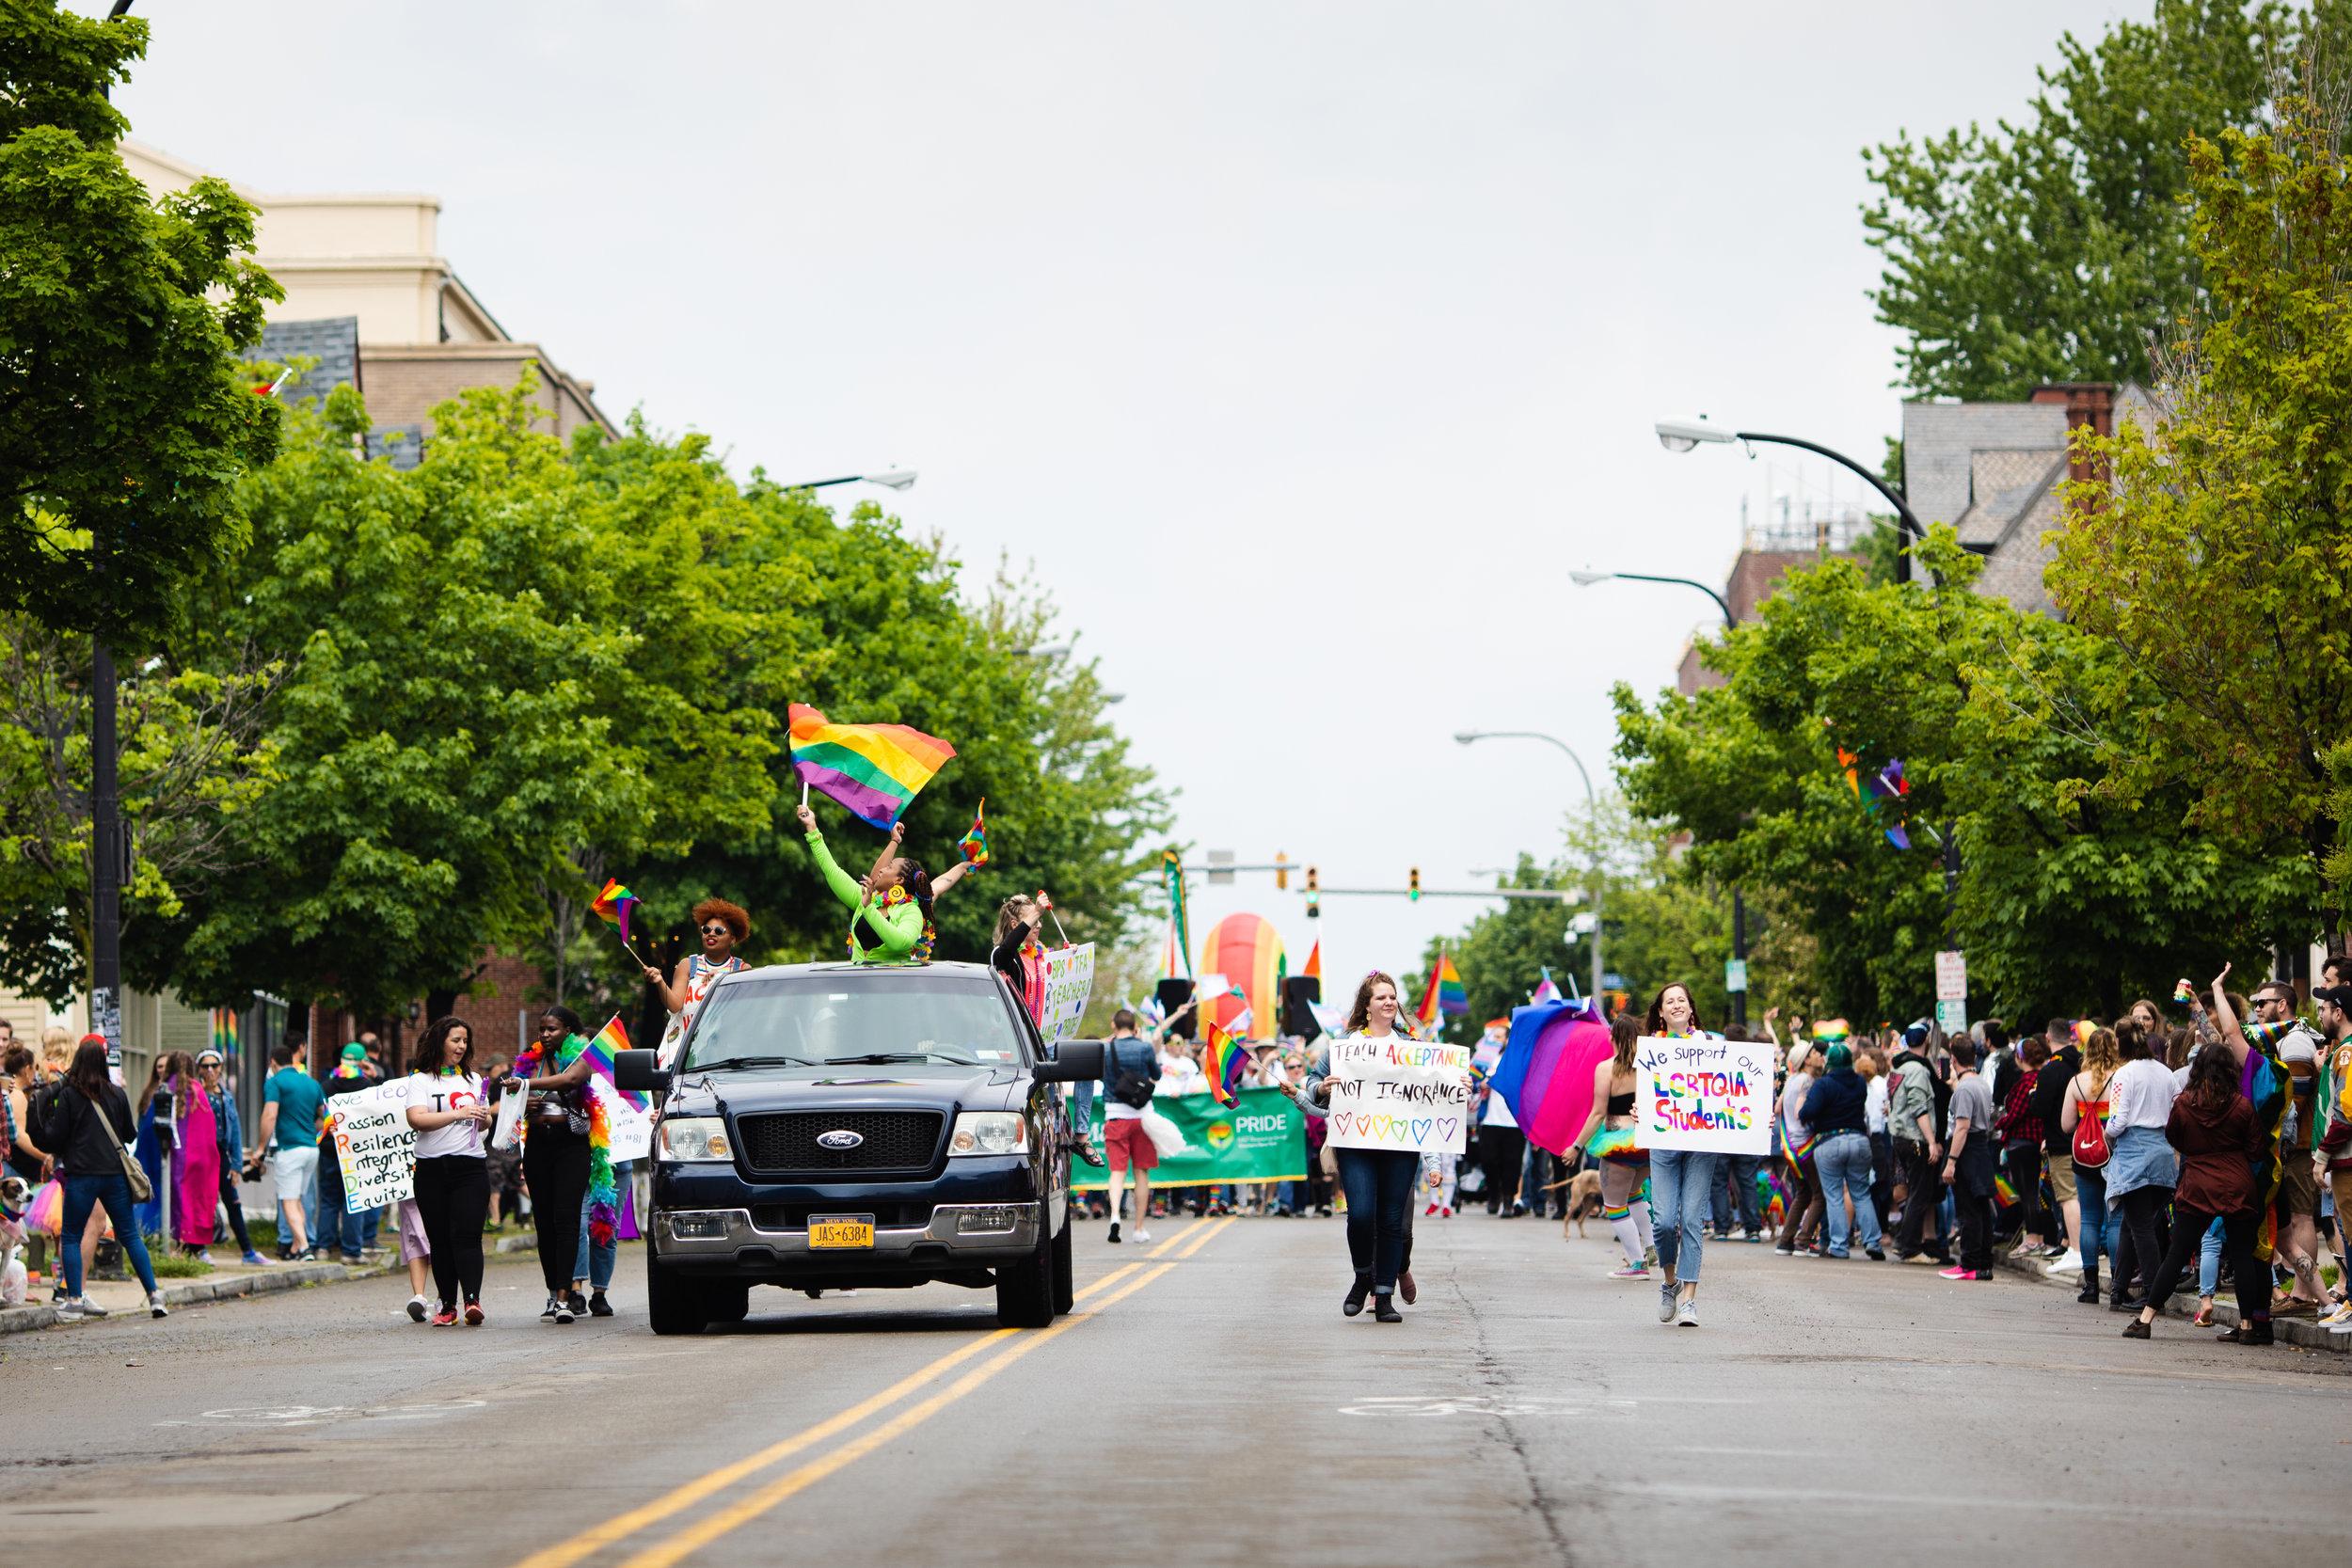 parade-13.jpg